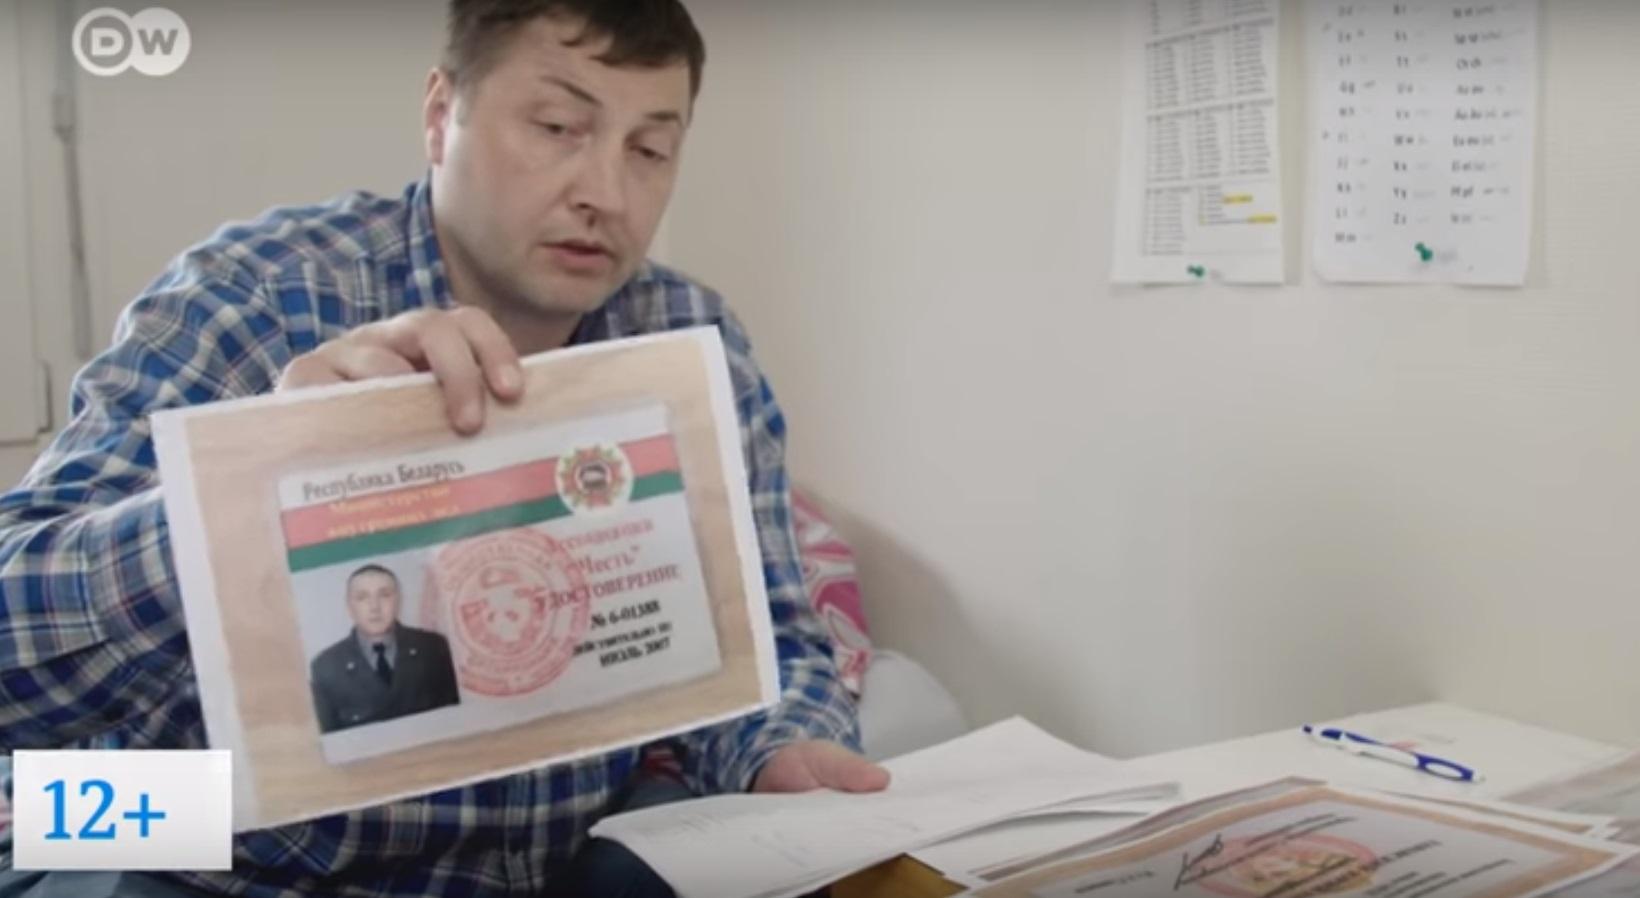 Jurij Garavskij (youtube/DW)